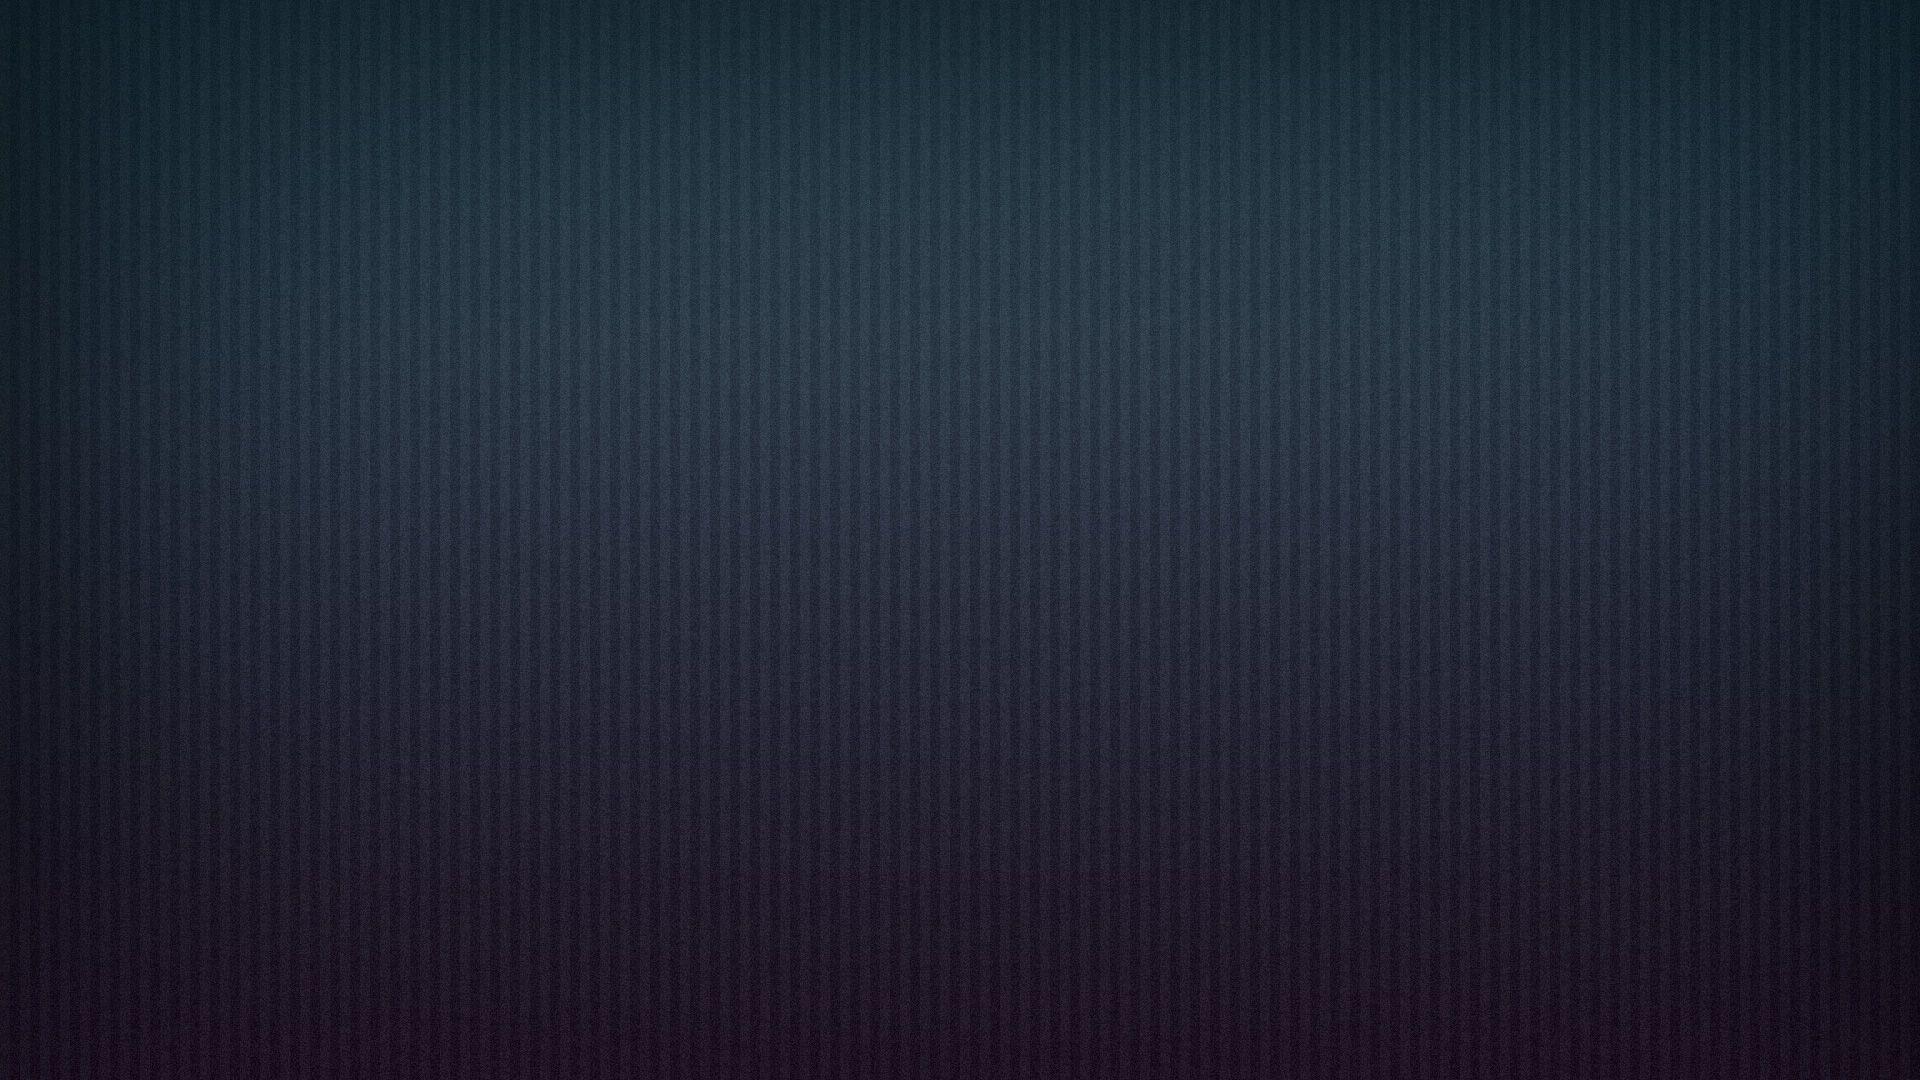 Free Website Background laptop background wallpaper